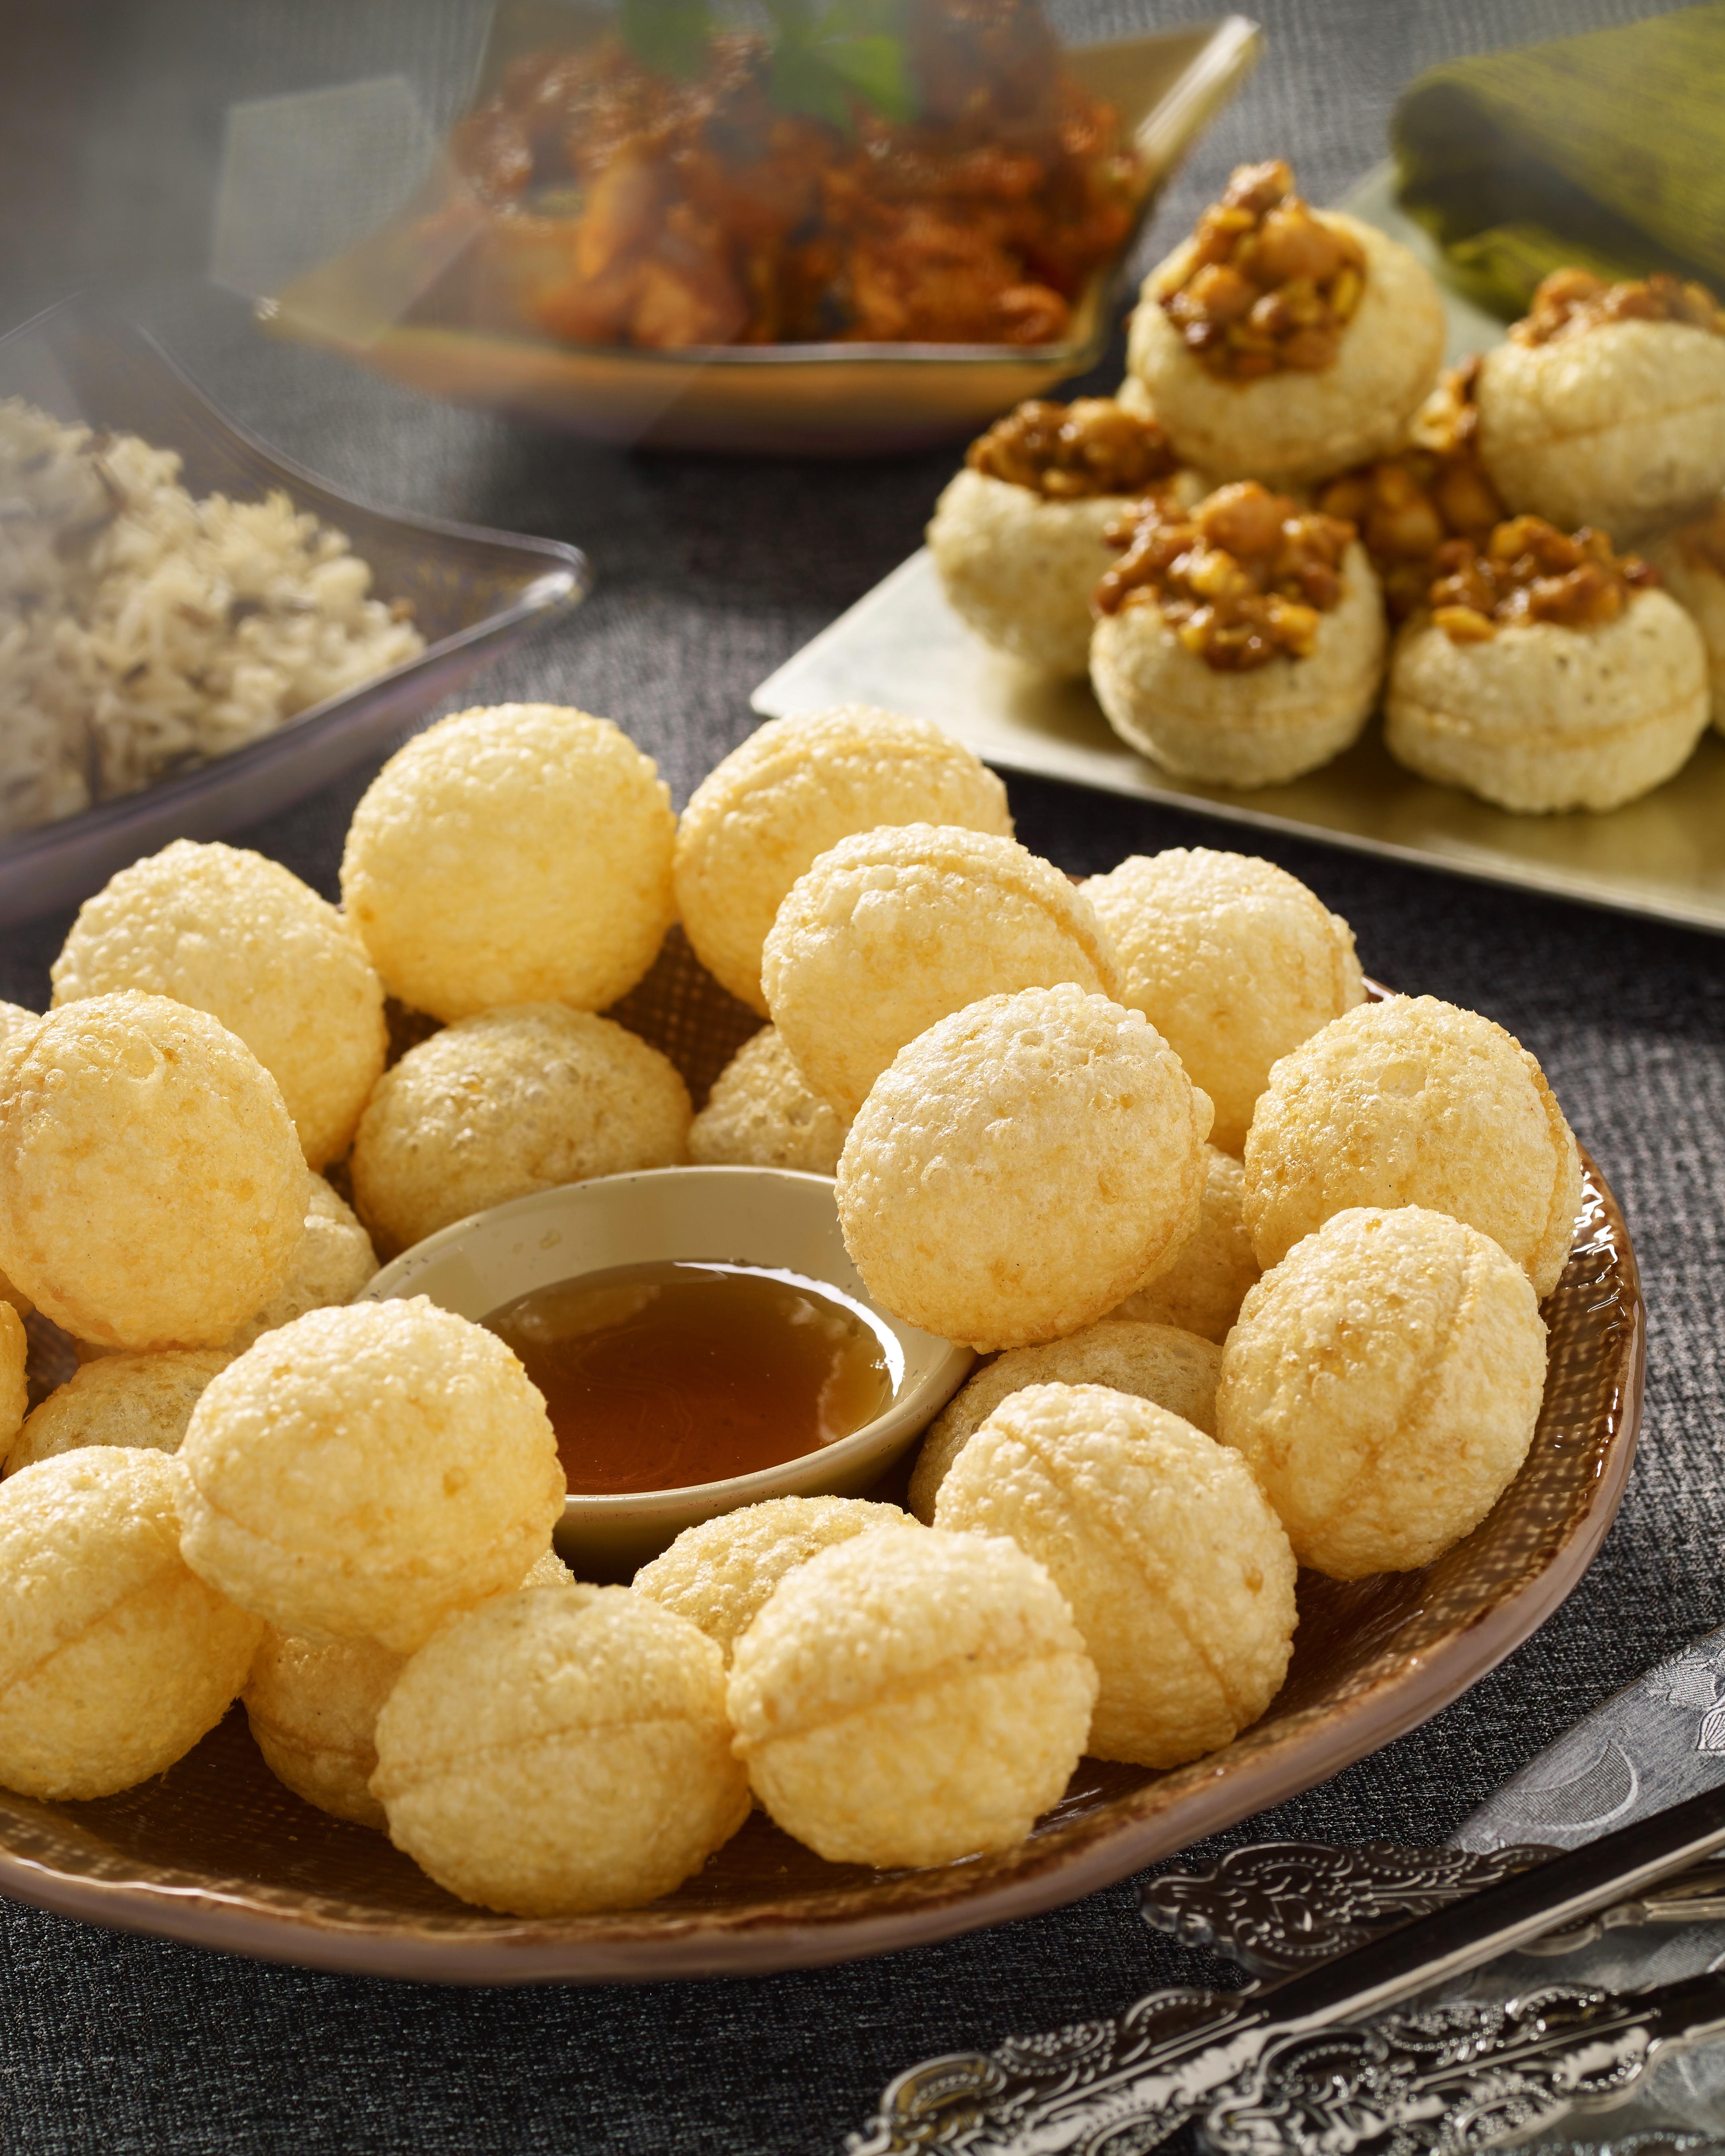 Distribution – Kashmir Crown Bakeries